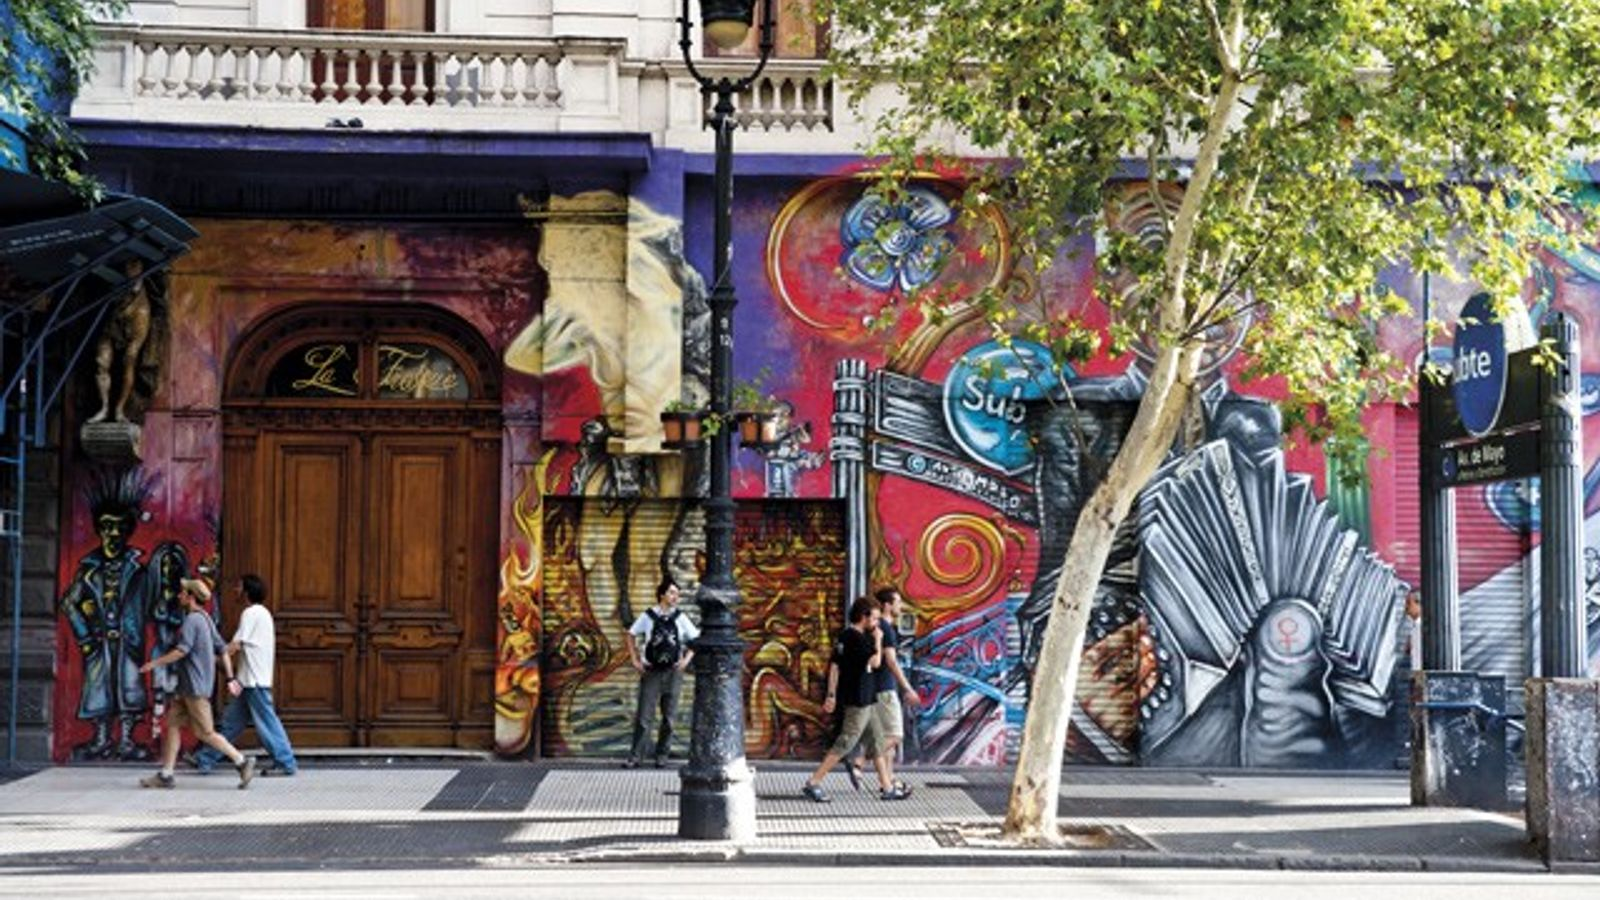 Graffiti in Avenida de Mayo